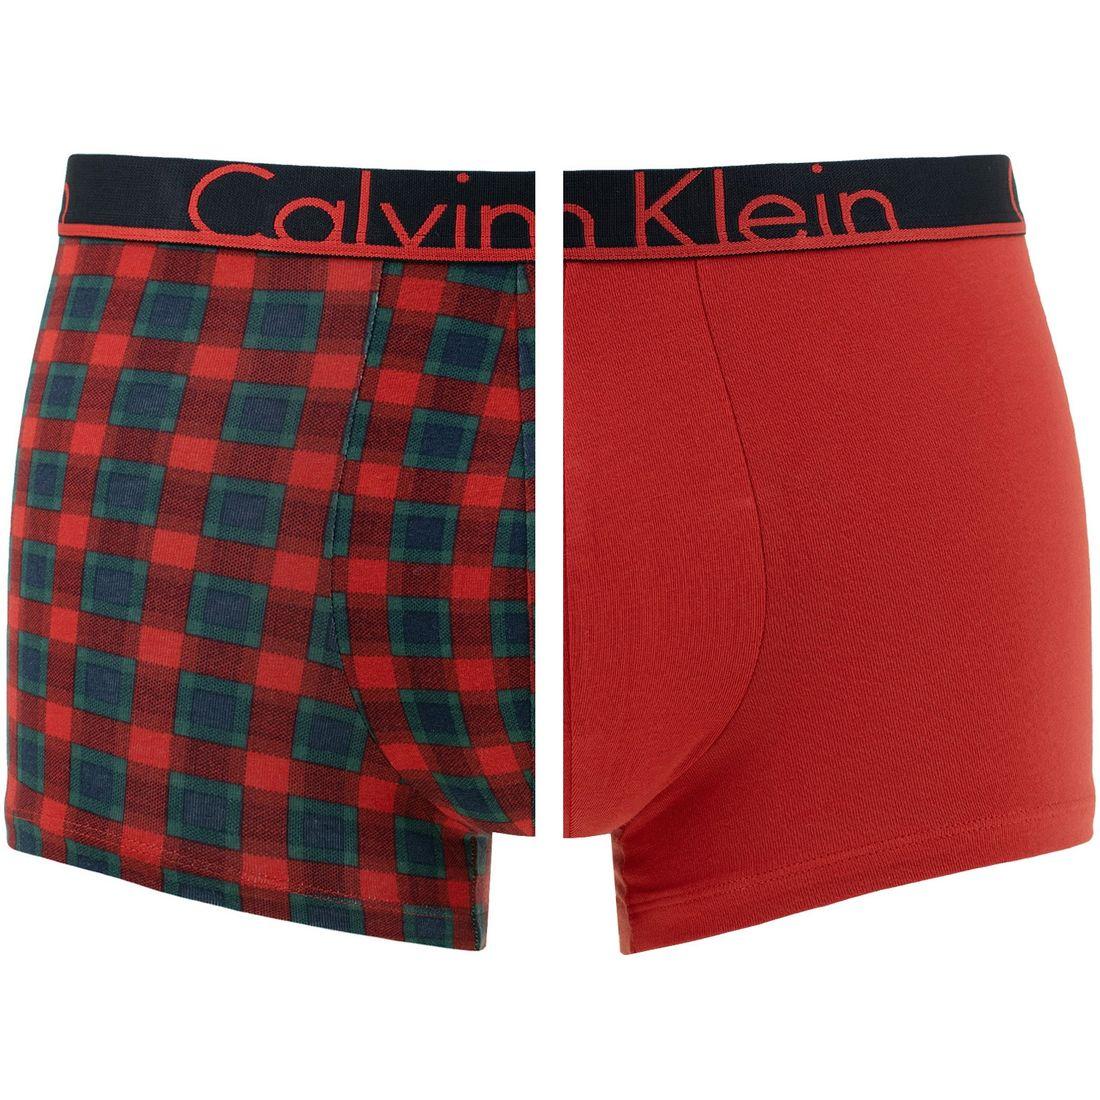 Afbeelding van Calvin Klein 2 pack trunks madison check & rood heren